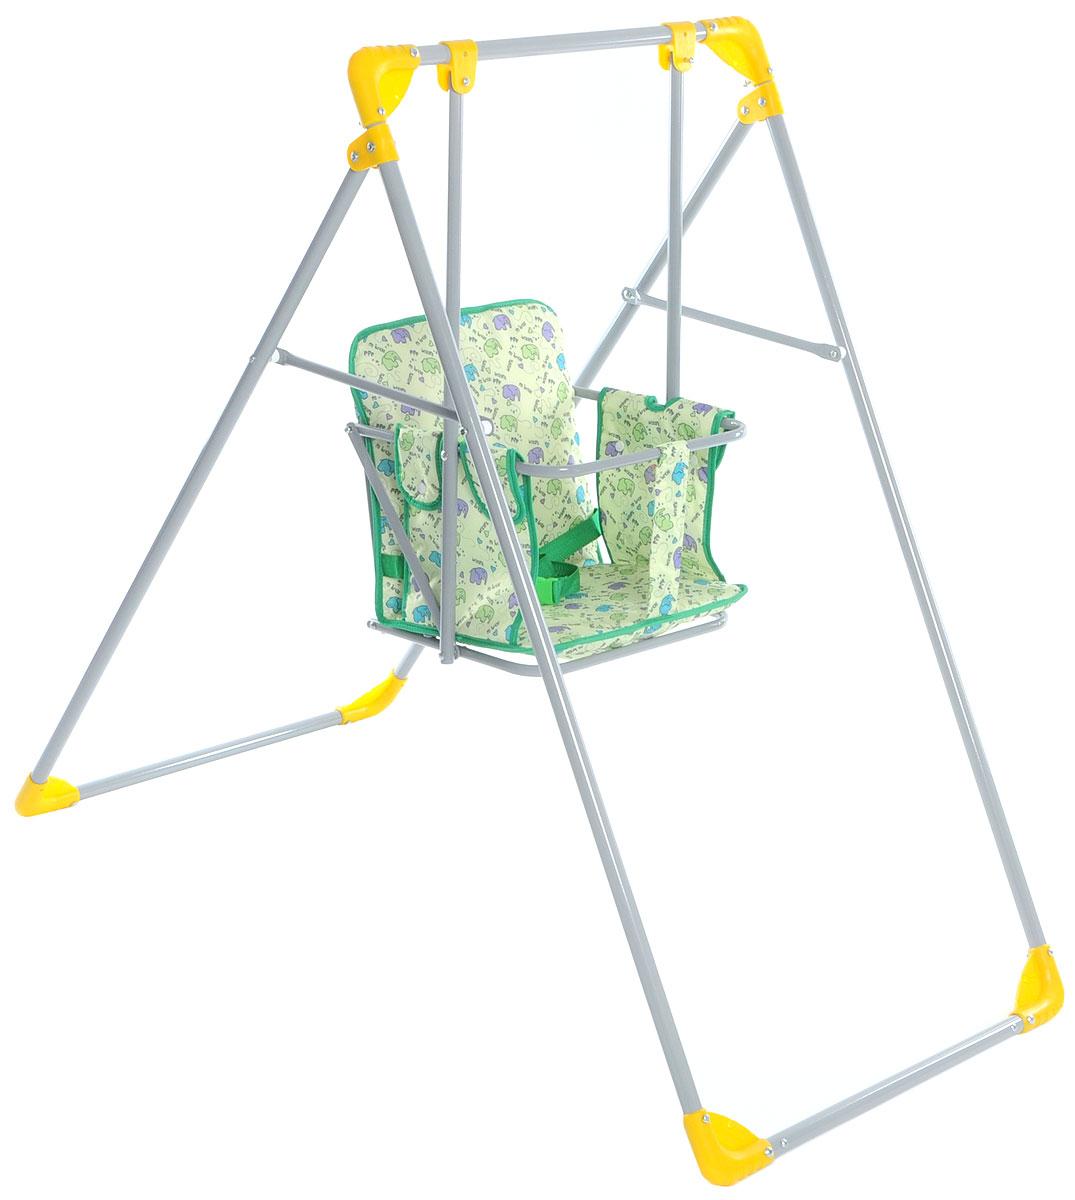 Фея Качели Чарли Слоники цвет зеленый 4238-10_зеленый, слоники